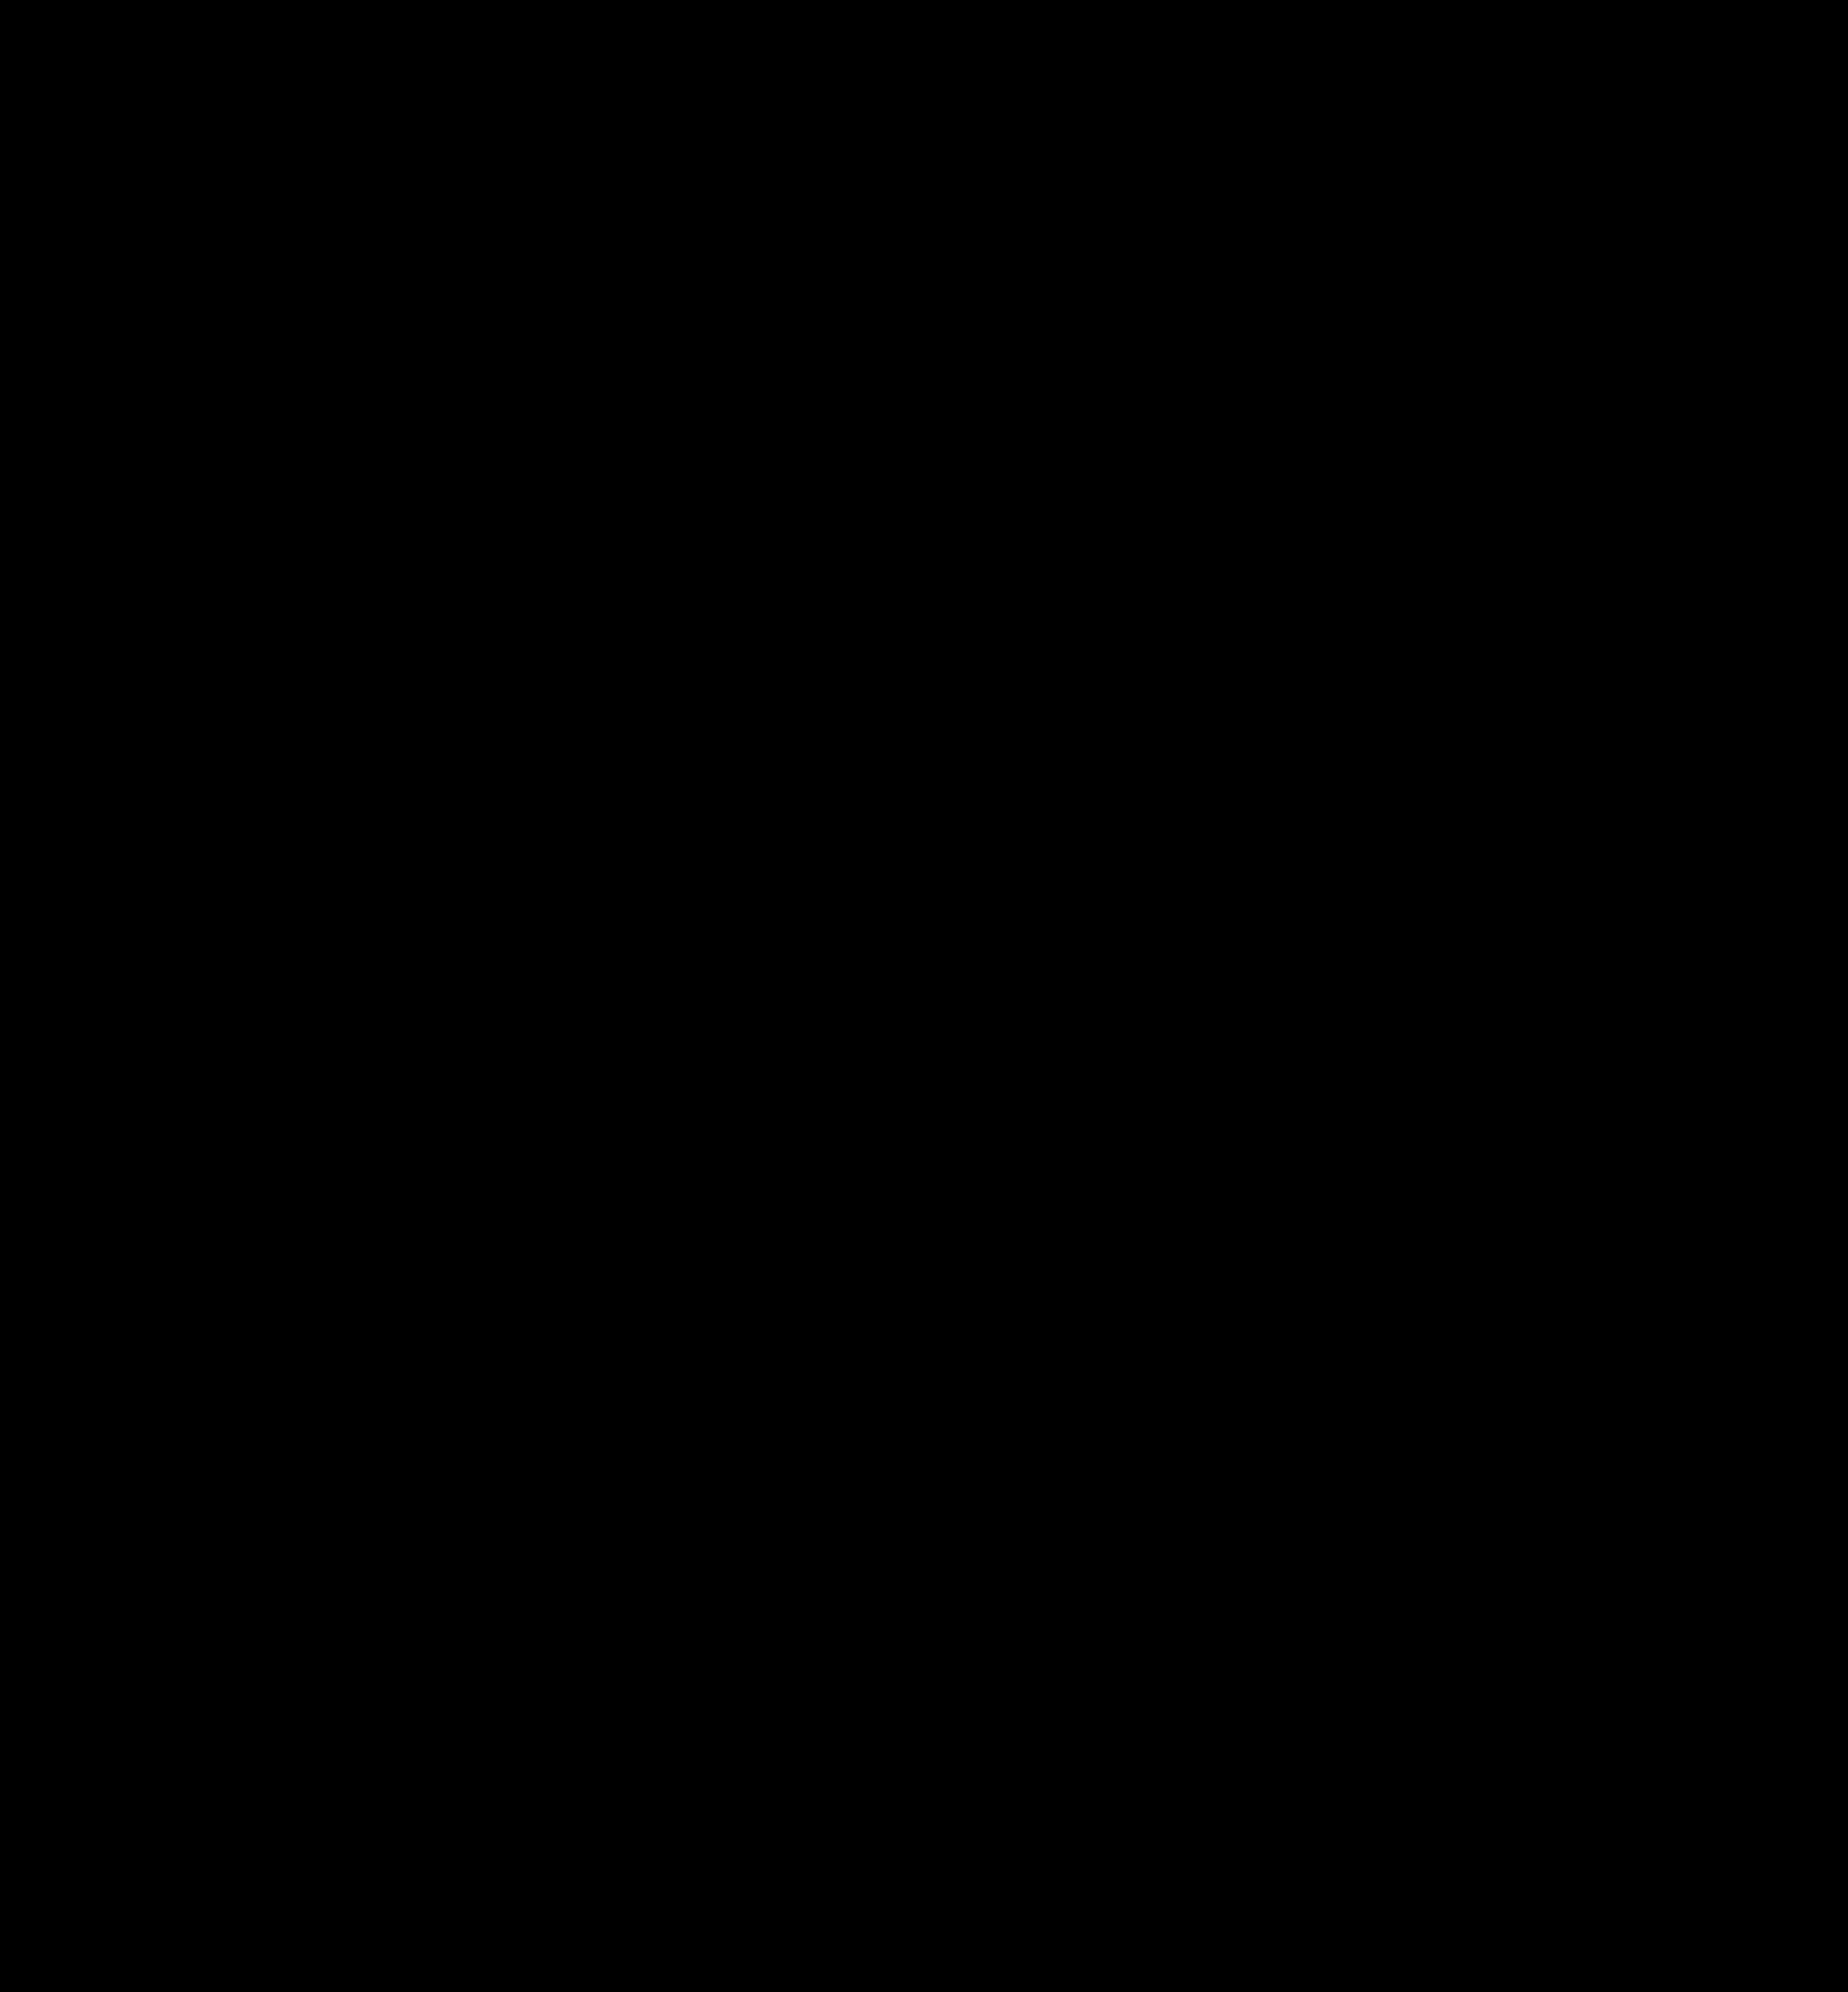 Demon PNG - 15207